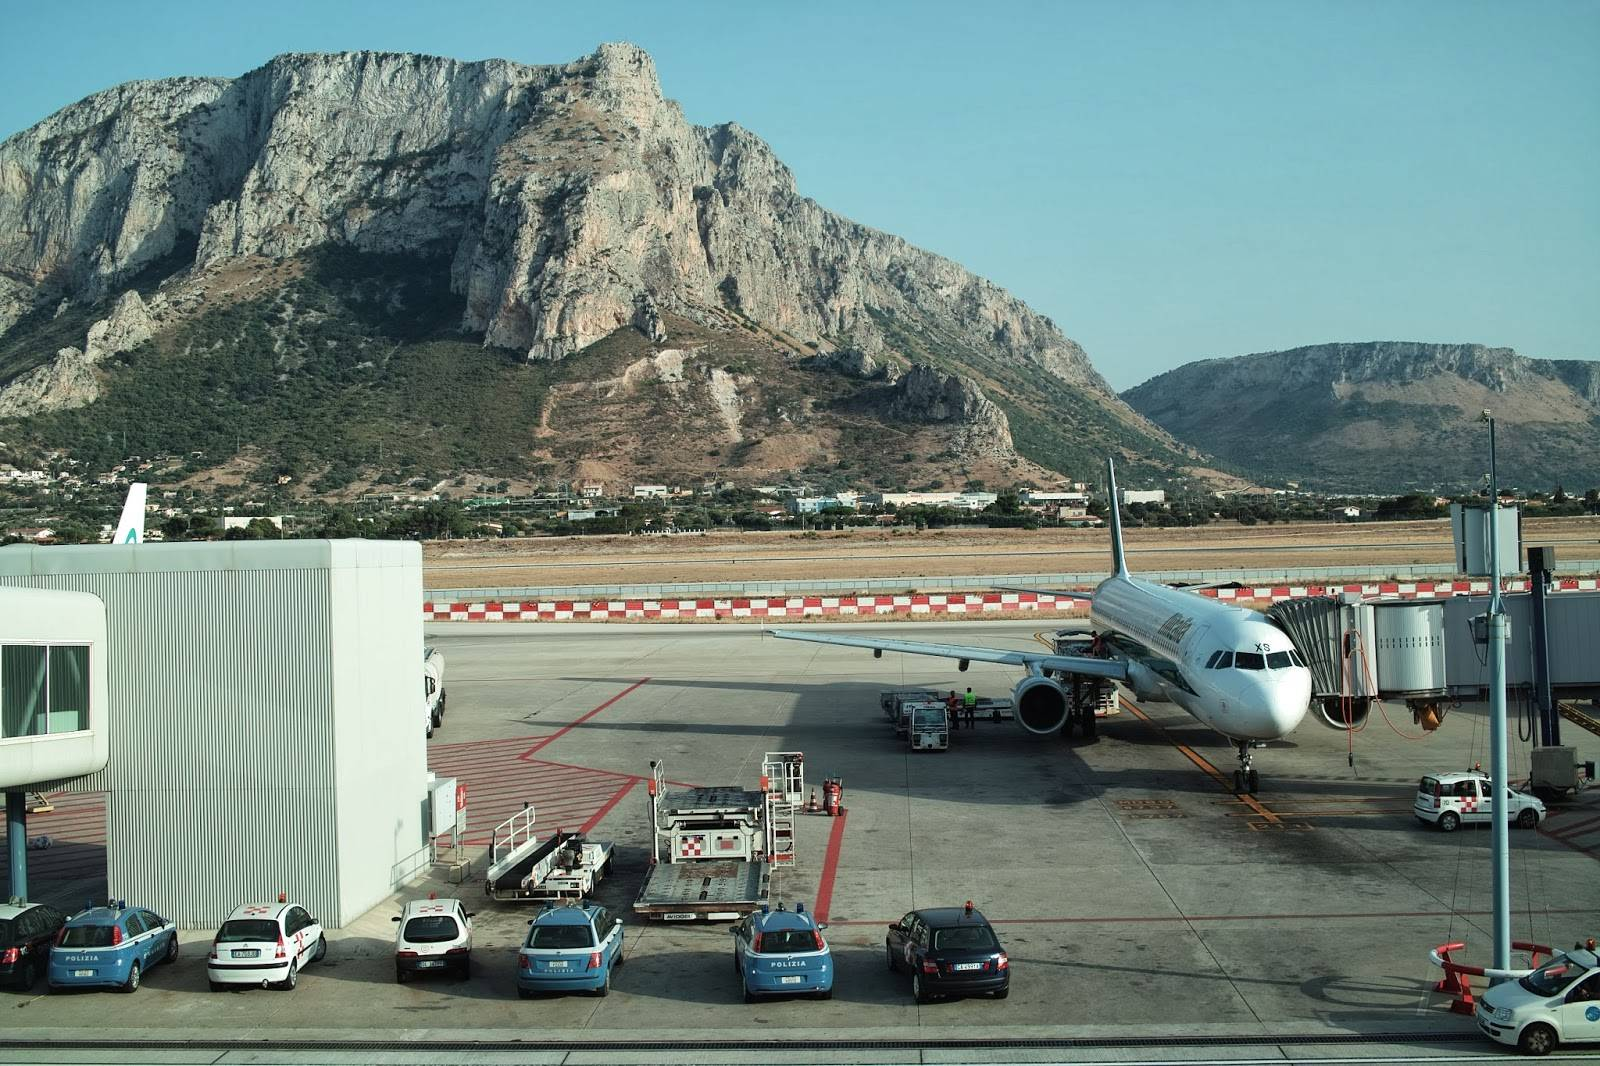 Сицилия аэропорт: список названий международных сицилийских авиалиний